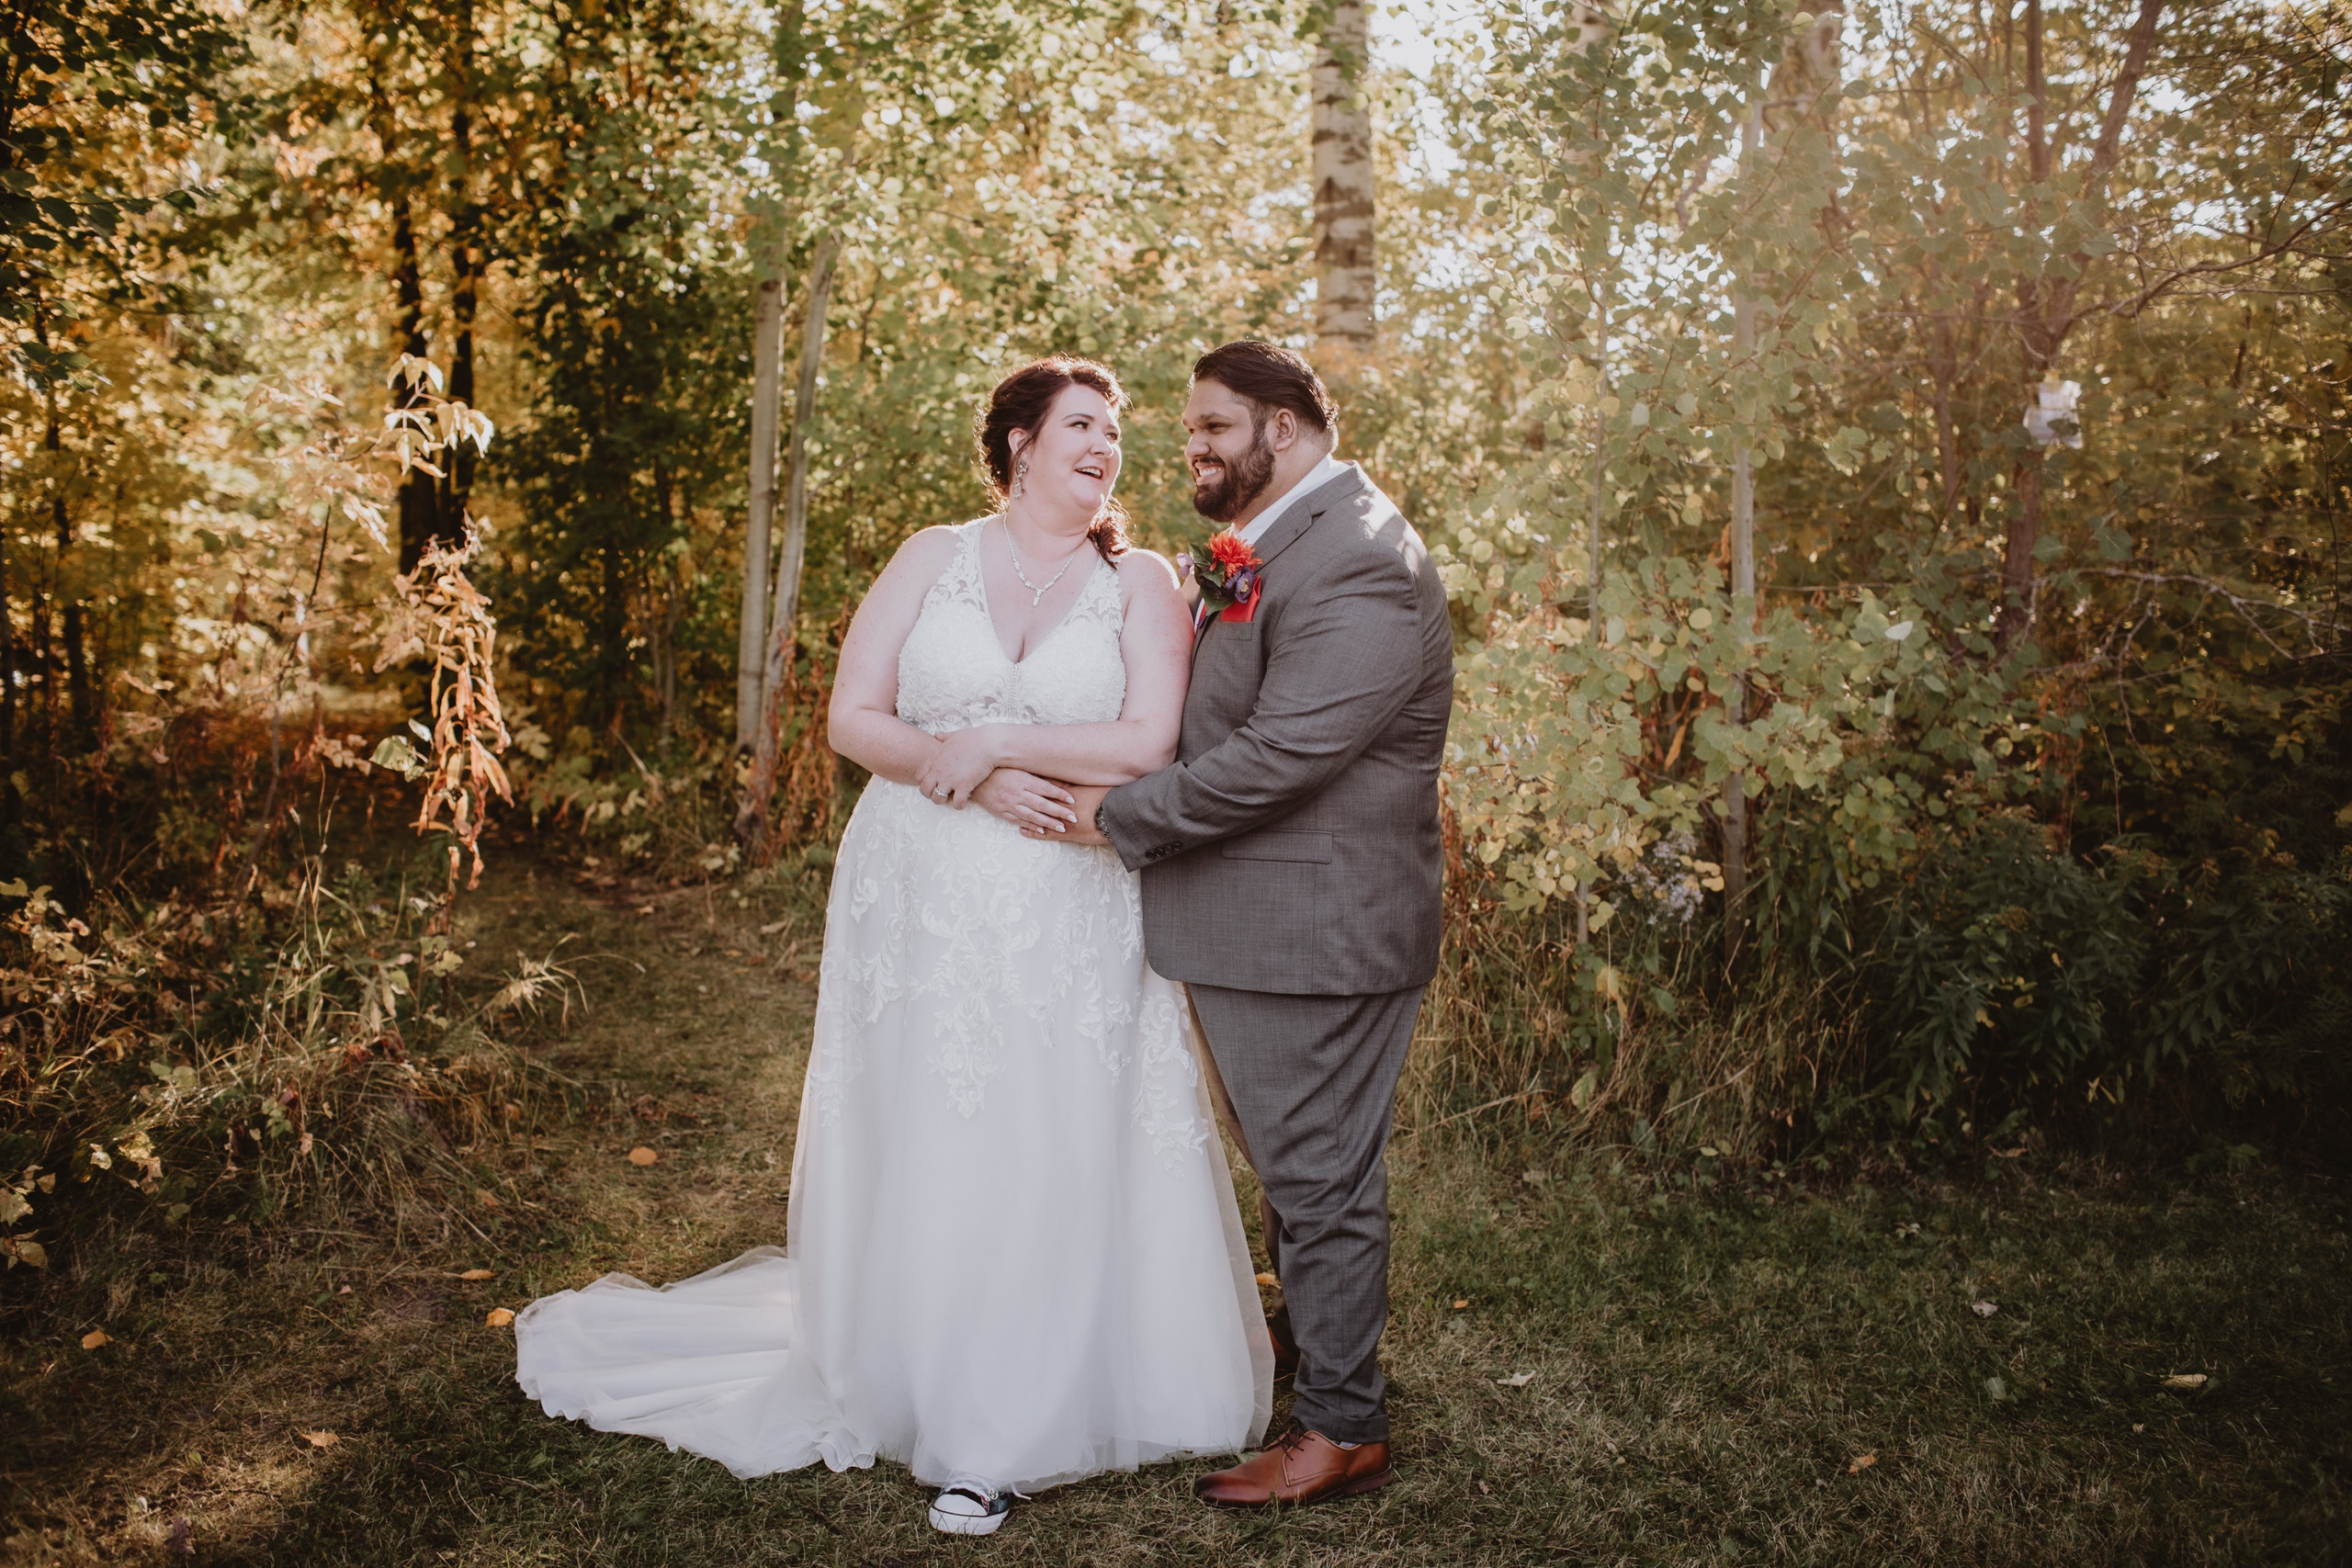 Golden Hour Wedding Portrait during fall wedding day.